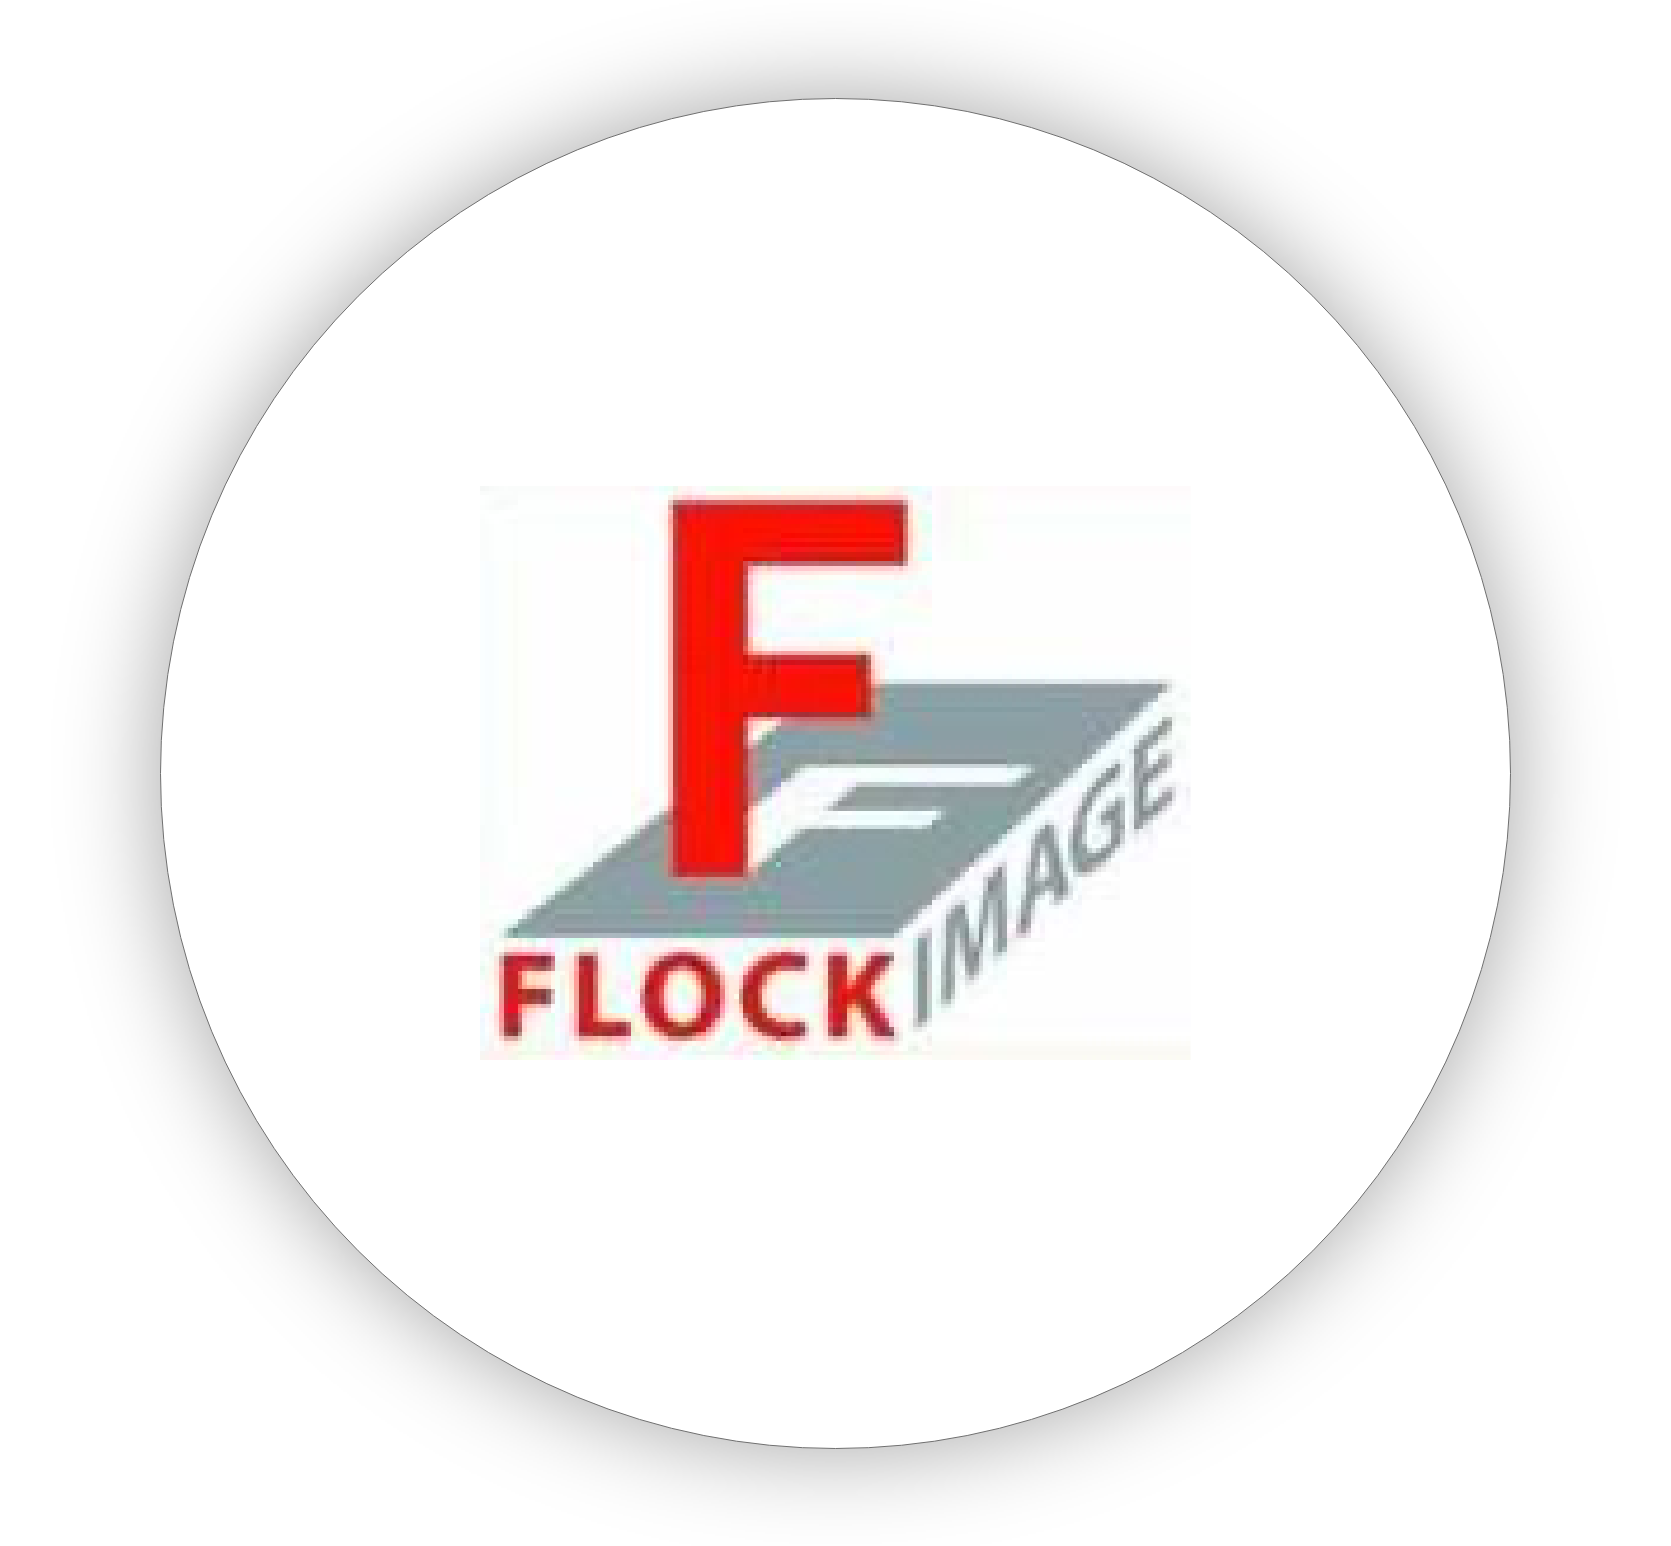 Flock Image